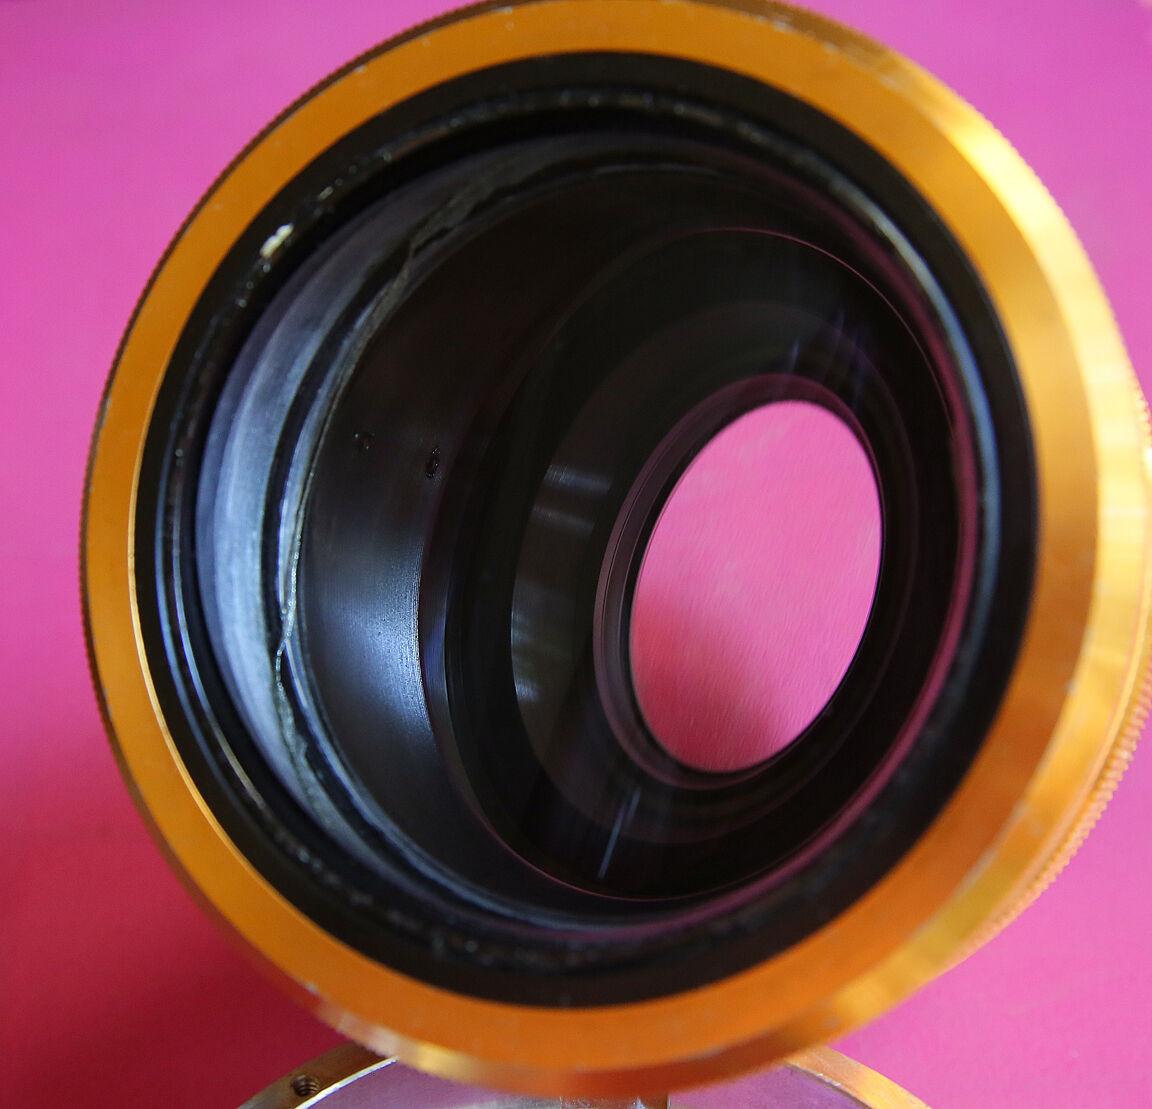 Anamorphot Kollmorgen-Kosaka 2X Anamorphic Lens Mod-KA298